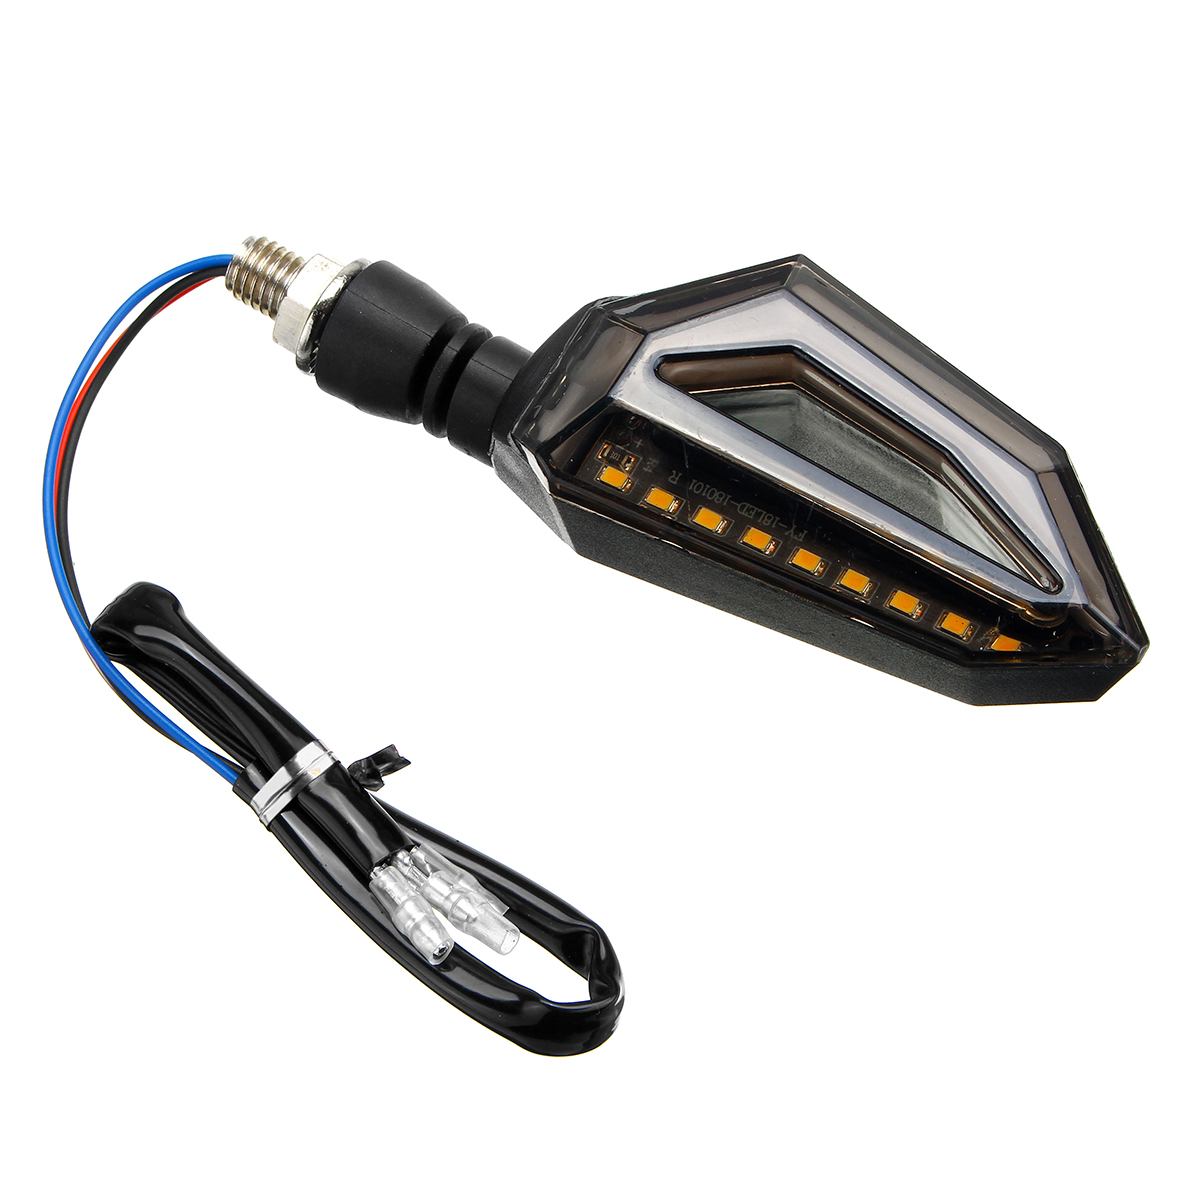 12V Motorcycle LED Turn Signal Indicator Lights For Kawasaki/Yamaha/BMW/Honda/KTM